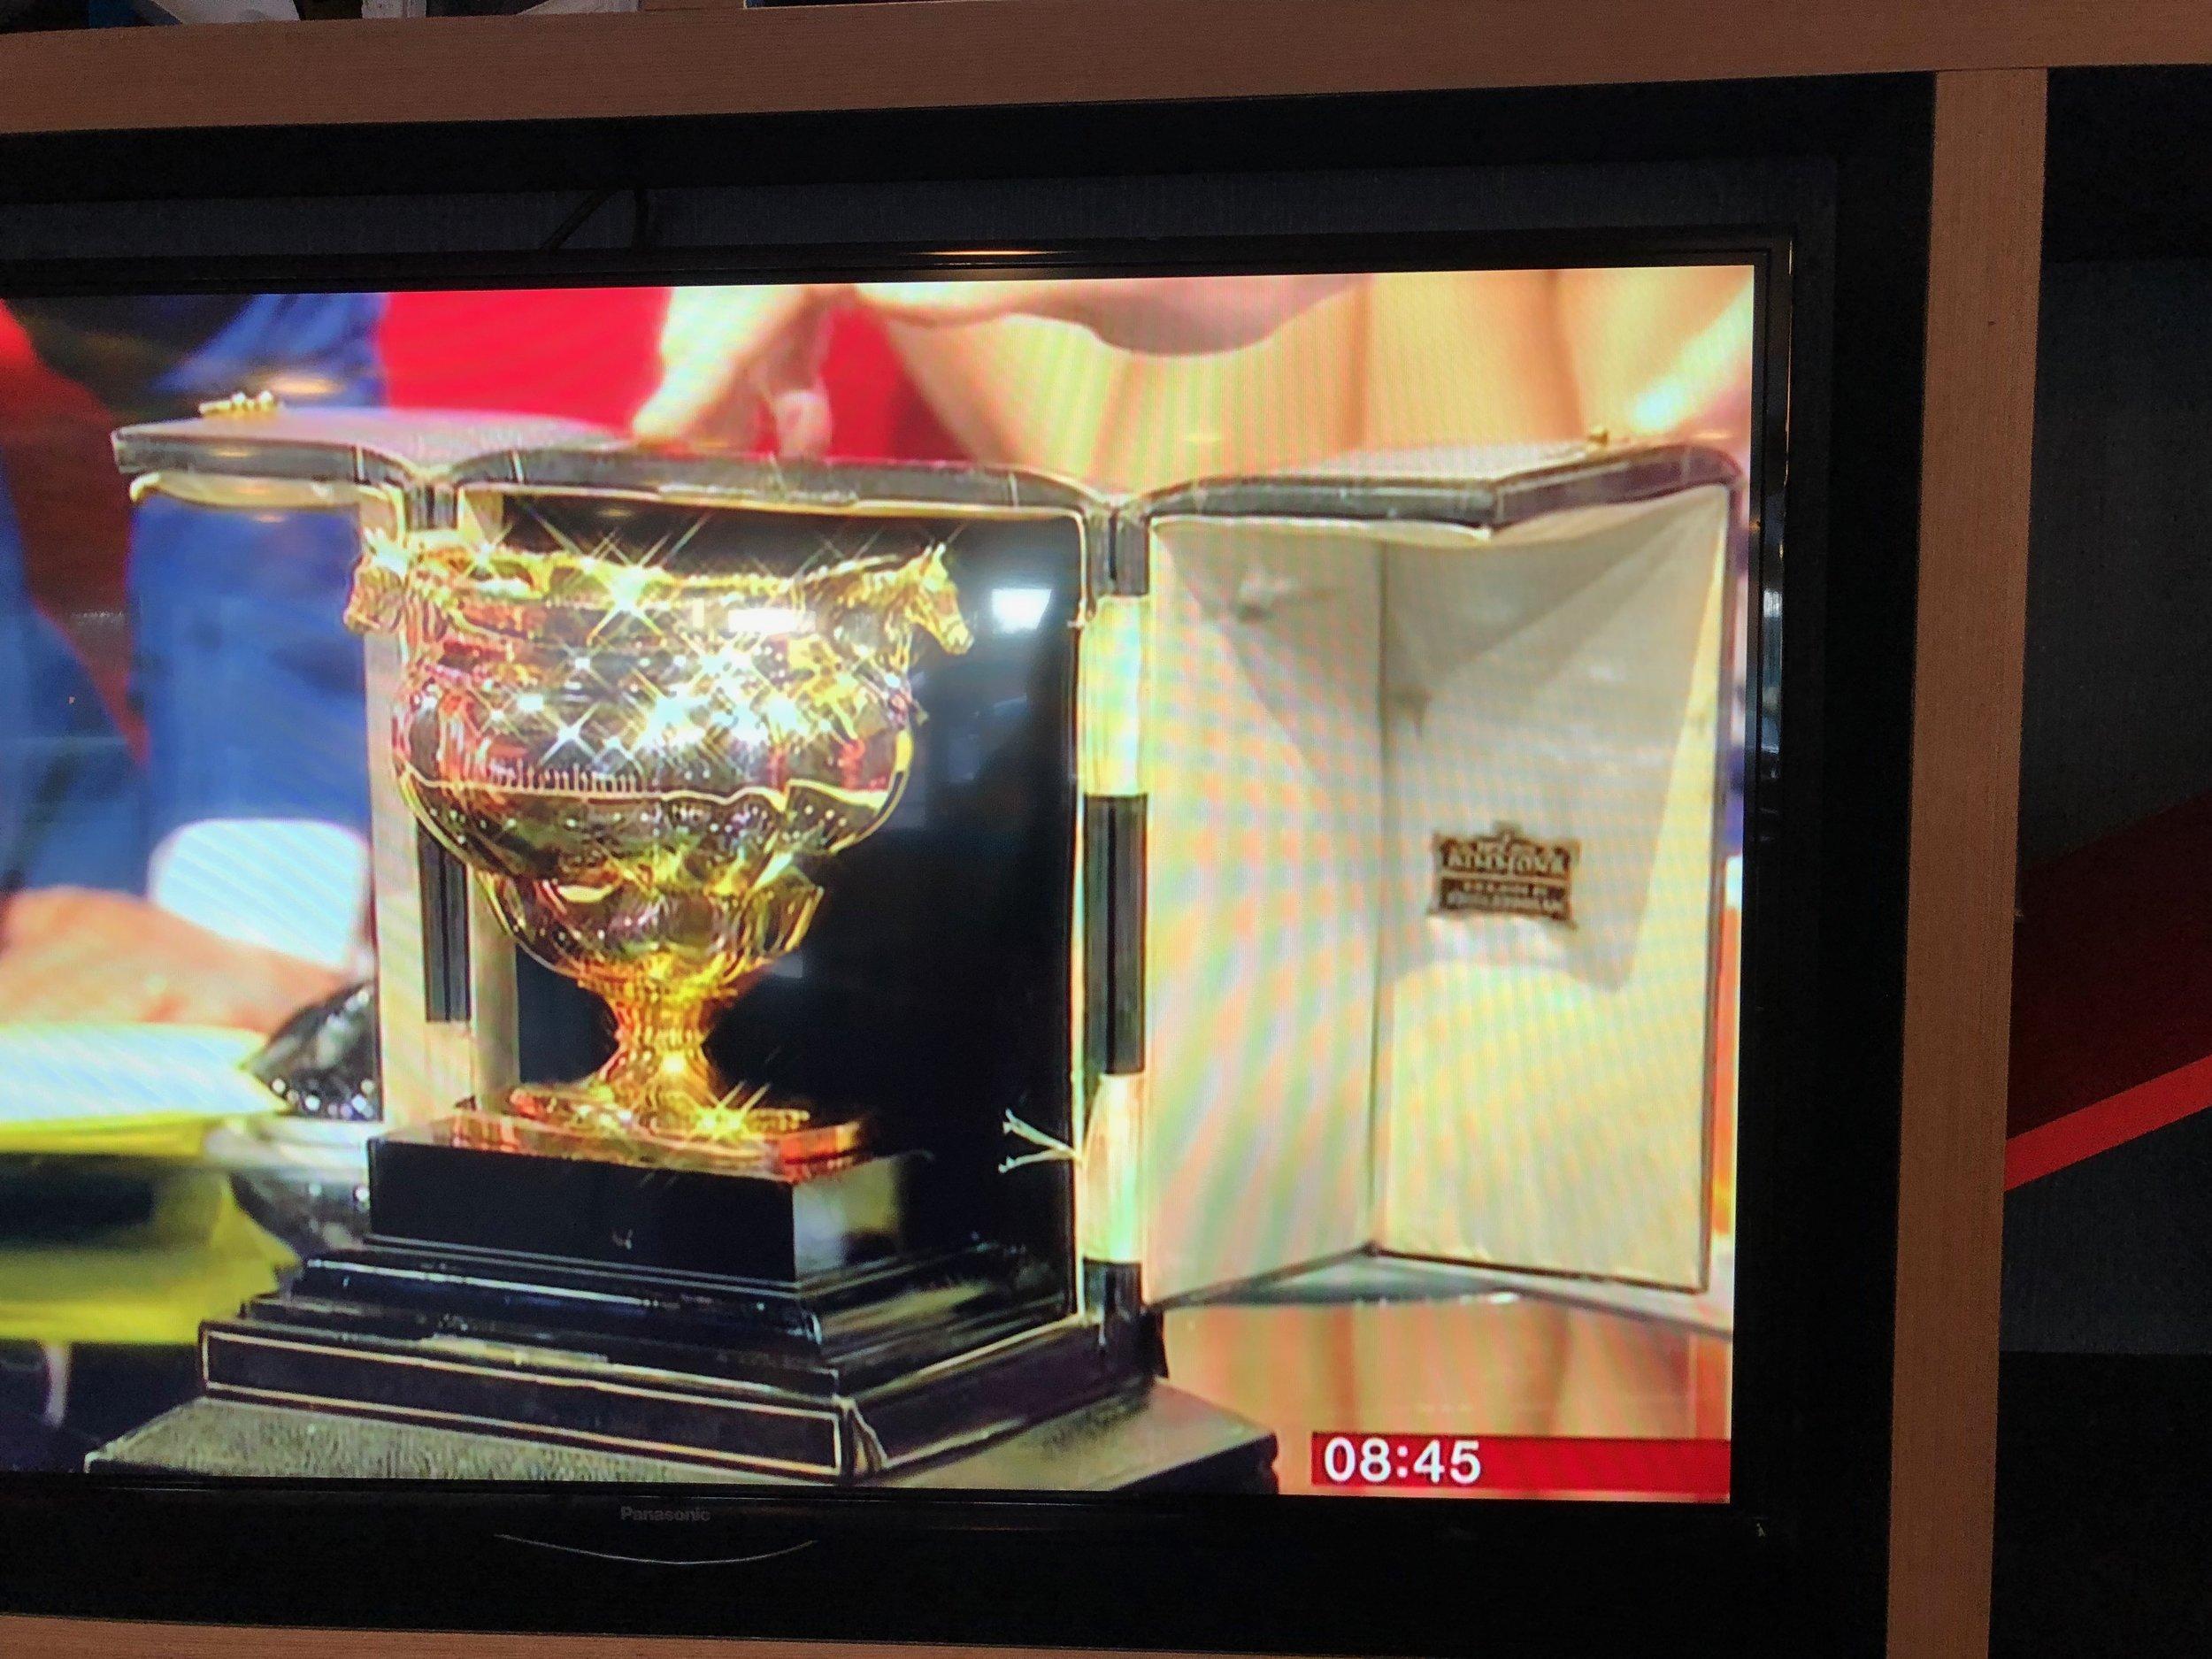 Cheltenham Gold Cup on TV at BBC Salford Studios